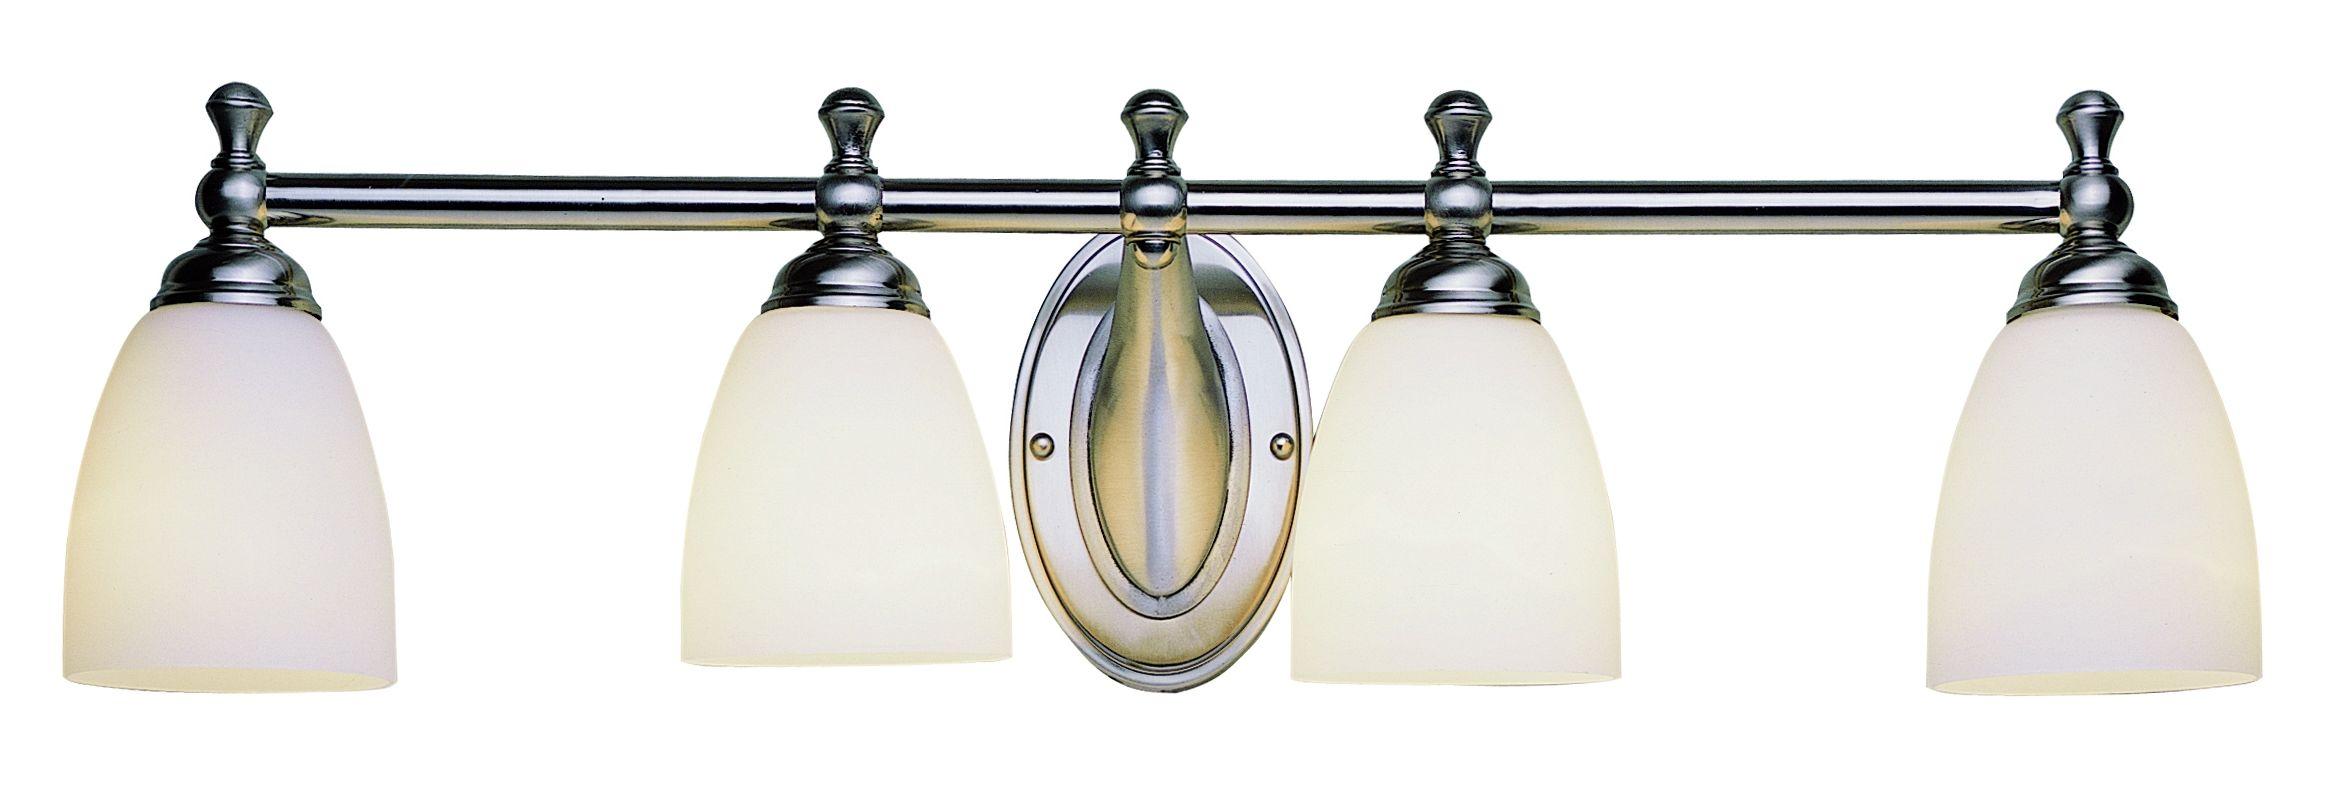 Trans Globe Lighting 3654 Four Light Up Lighting Wall Sconce Rubbed Sale $188.10 ITEM: bci723752 ID#:3654 ROB UPC: 736916202503 :